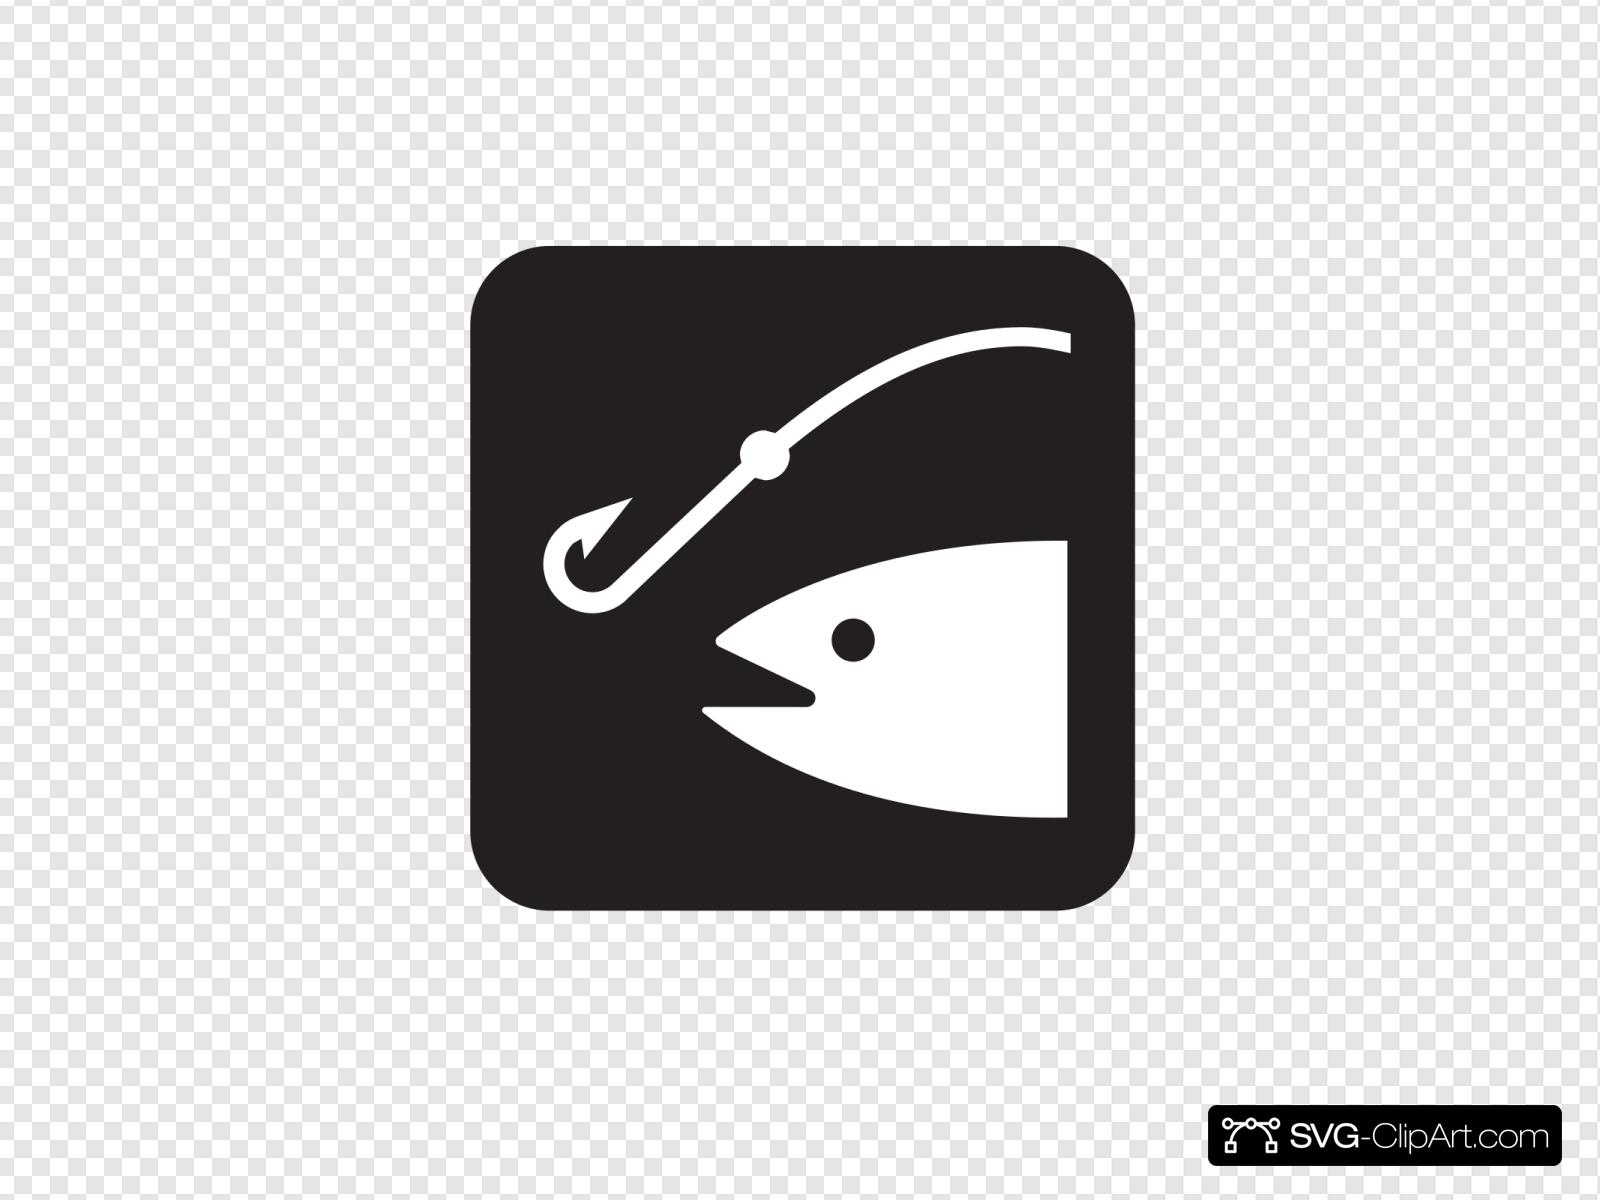 Download Fishing Black Svg Vector Fishing Black Clip Art Svg Clipart